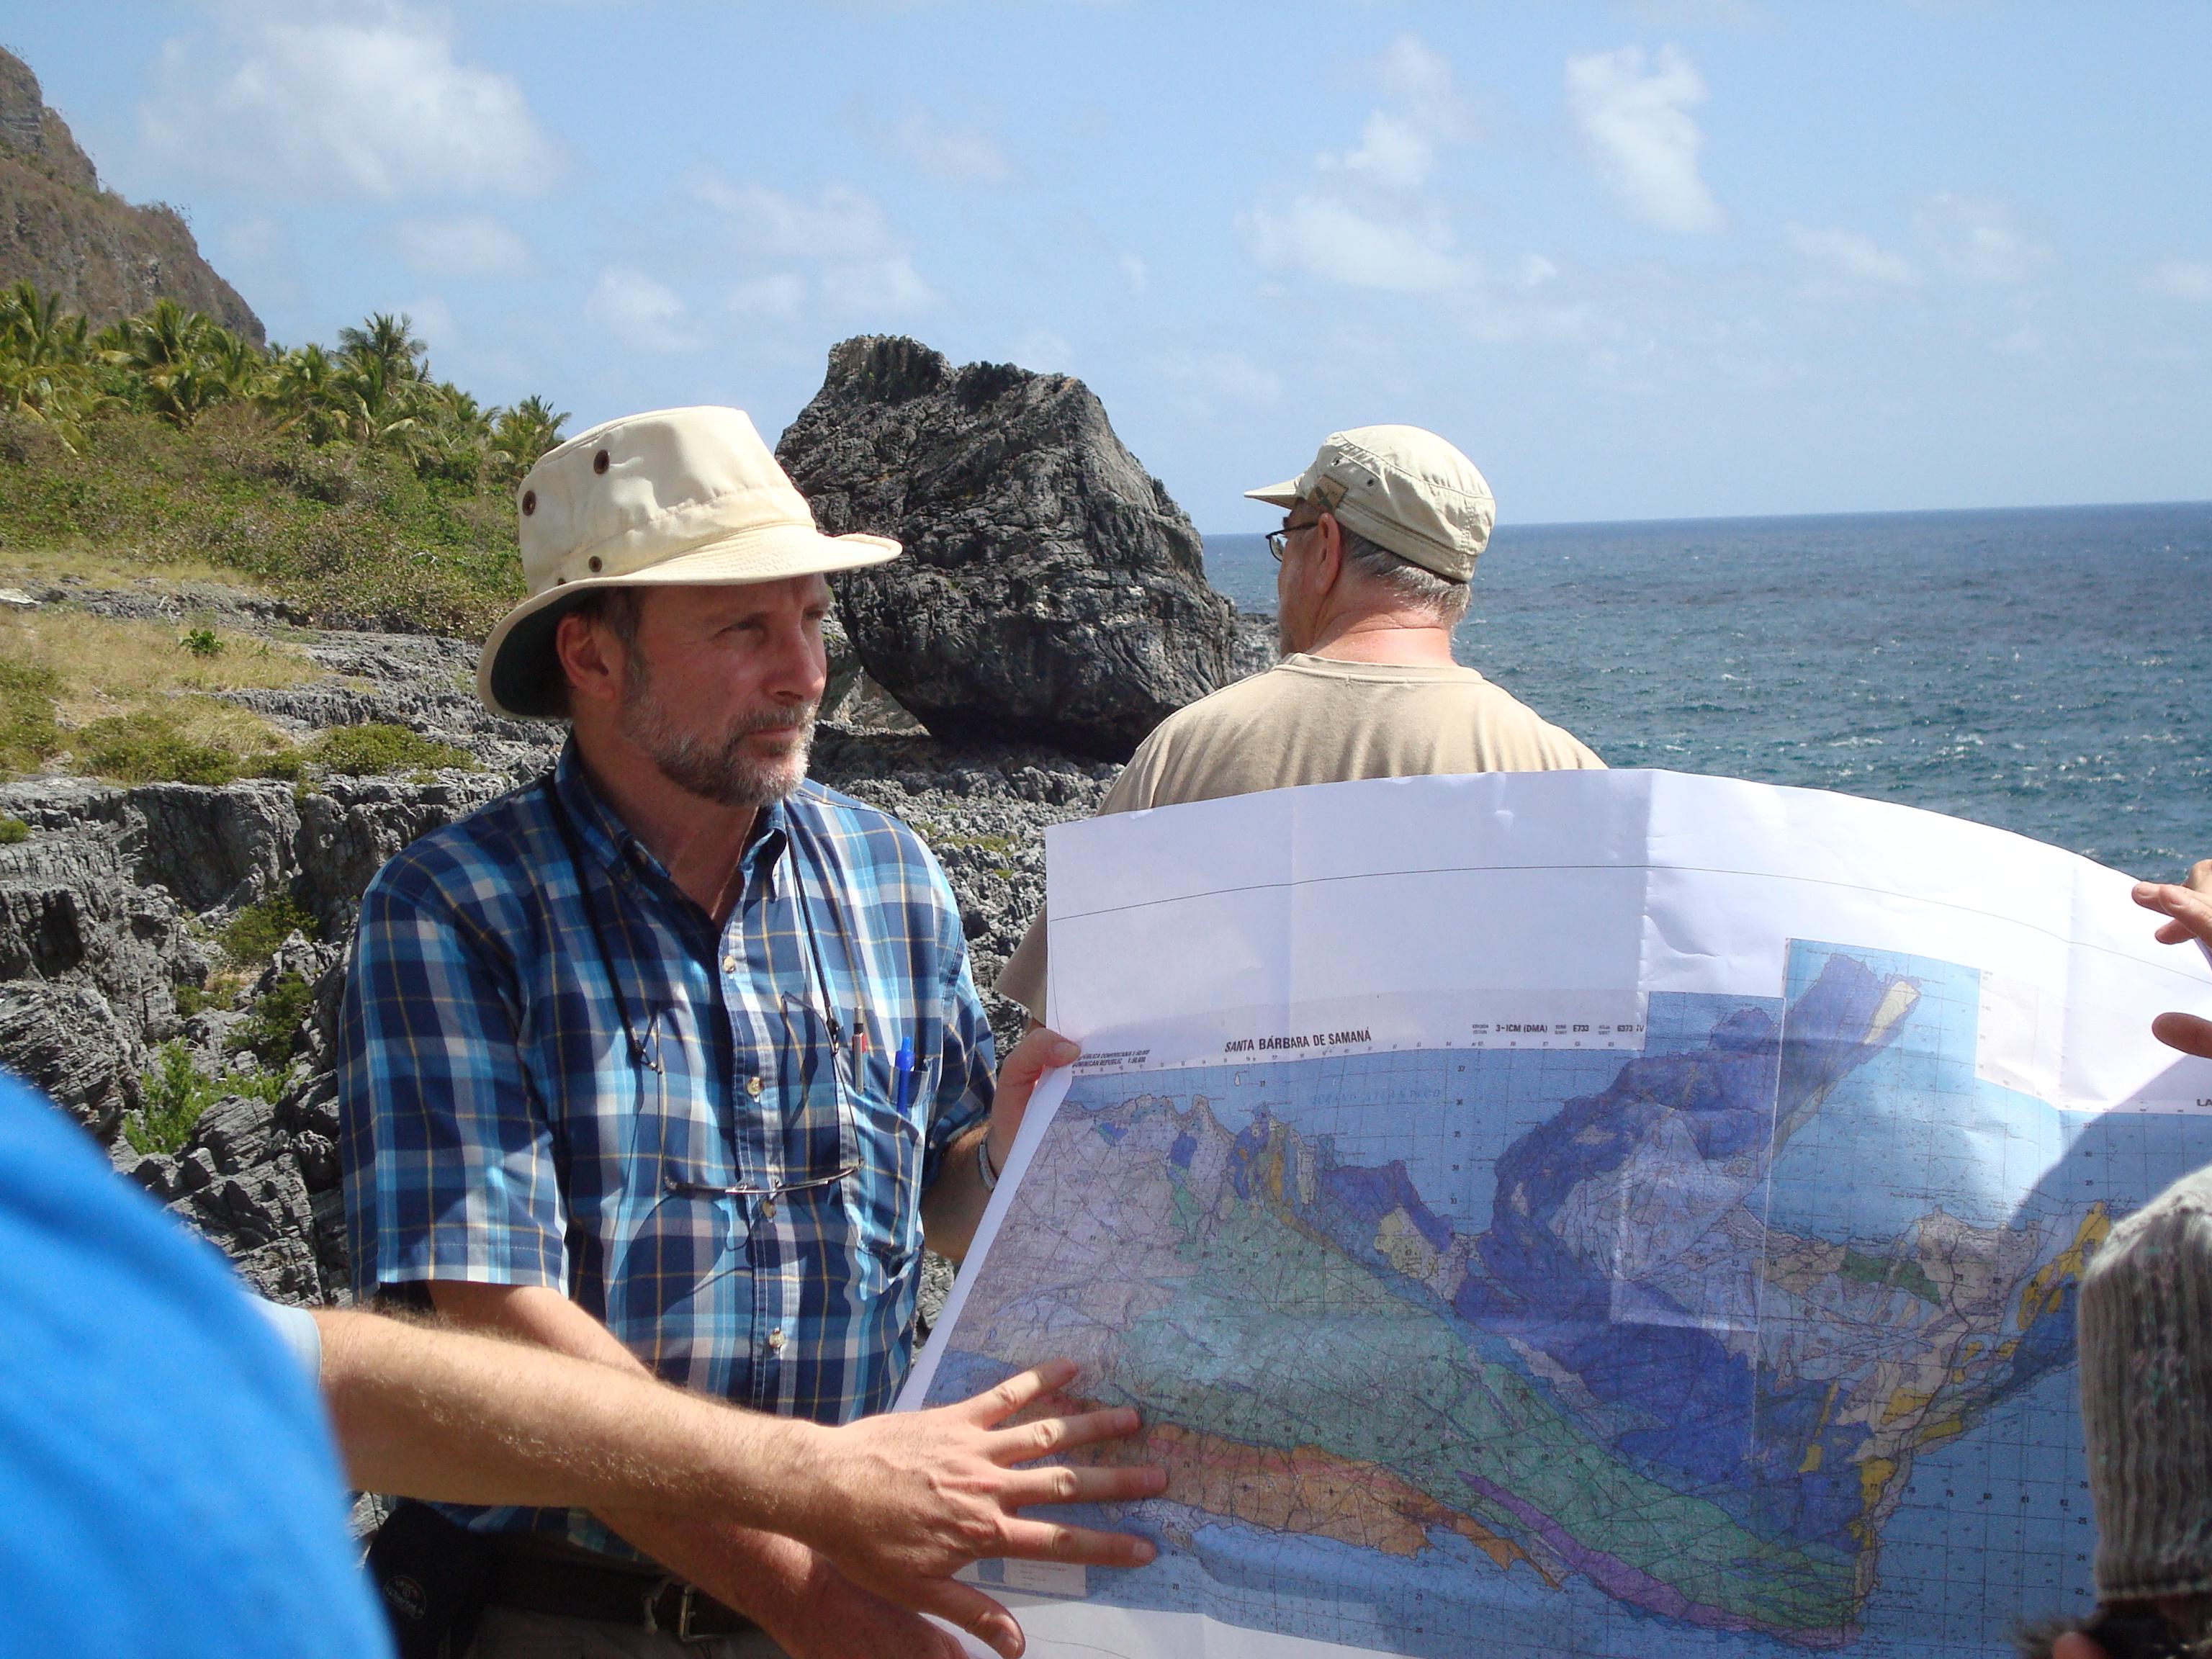 Grenville Draper engages in field work in Santa Barbara de Samana, Dominican Republic.